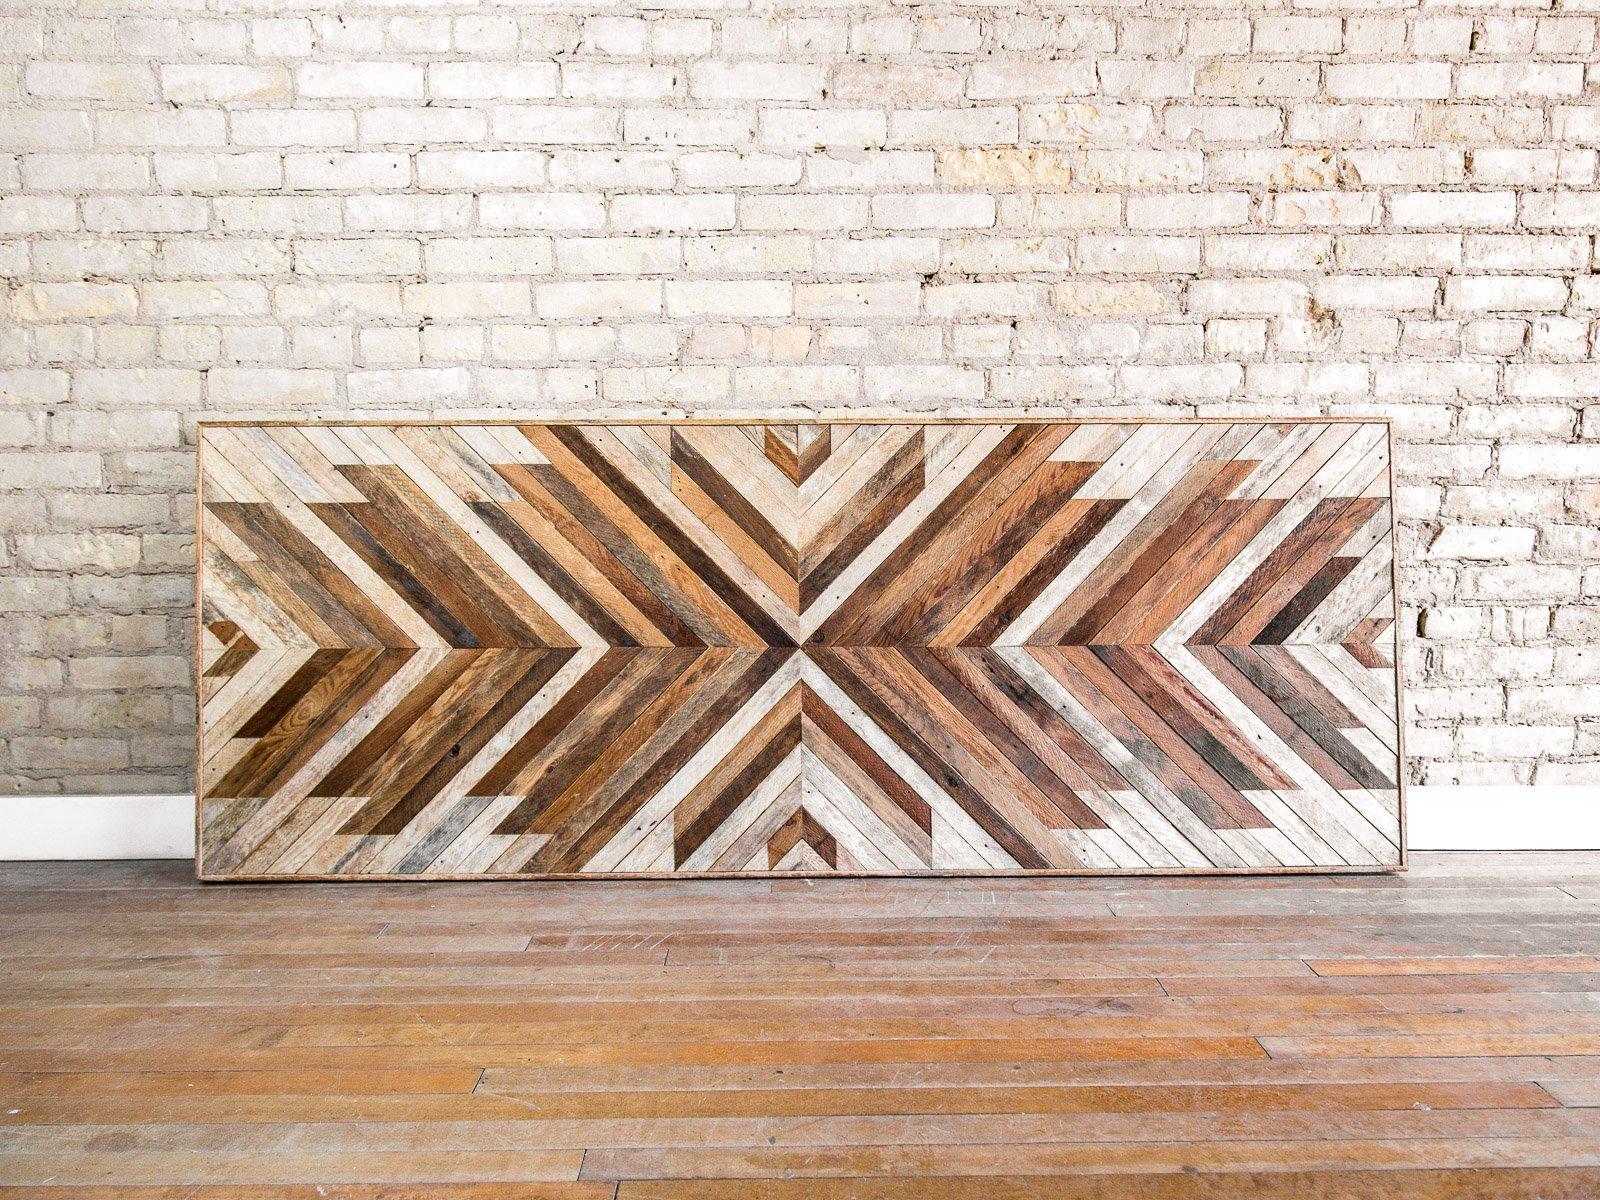 Reclaimed Wood Wall Art Wall Decor Wood Art King Wood Headboard Wall Art Minimal Art Wood Headboard Rustic Modern 80x30